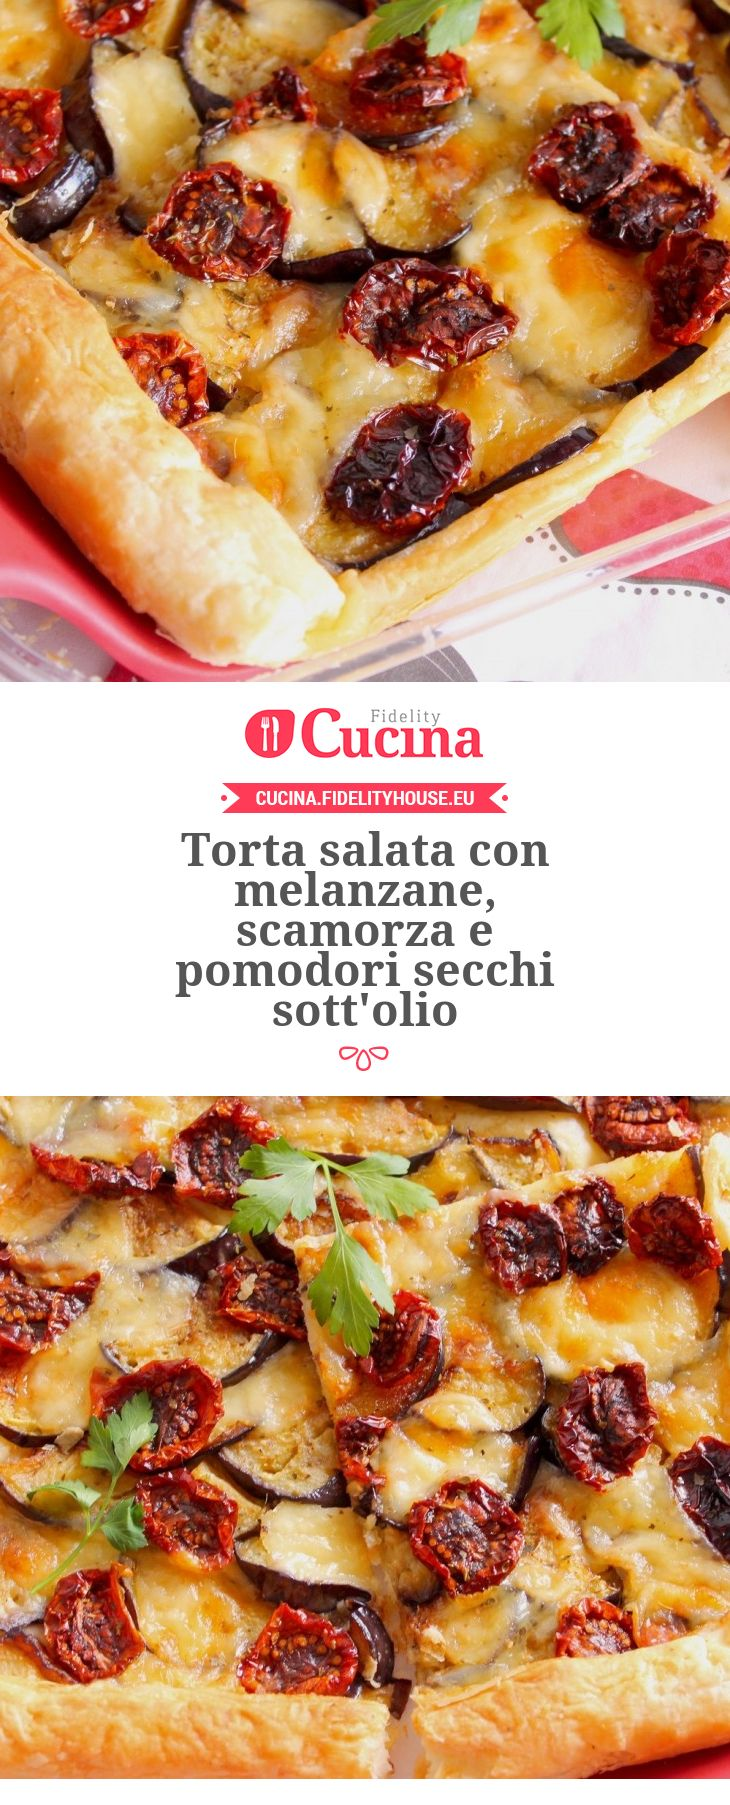 ba9e440102c13a8d8eb4cc4e0d91e95e - Ricette Con Pomodori Secchi